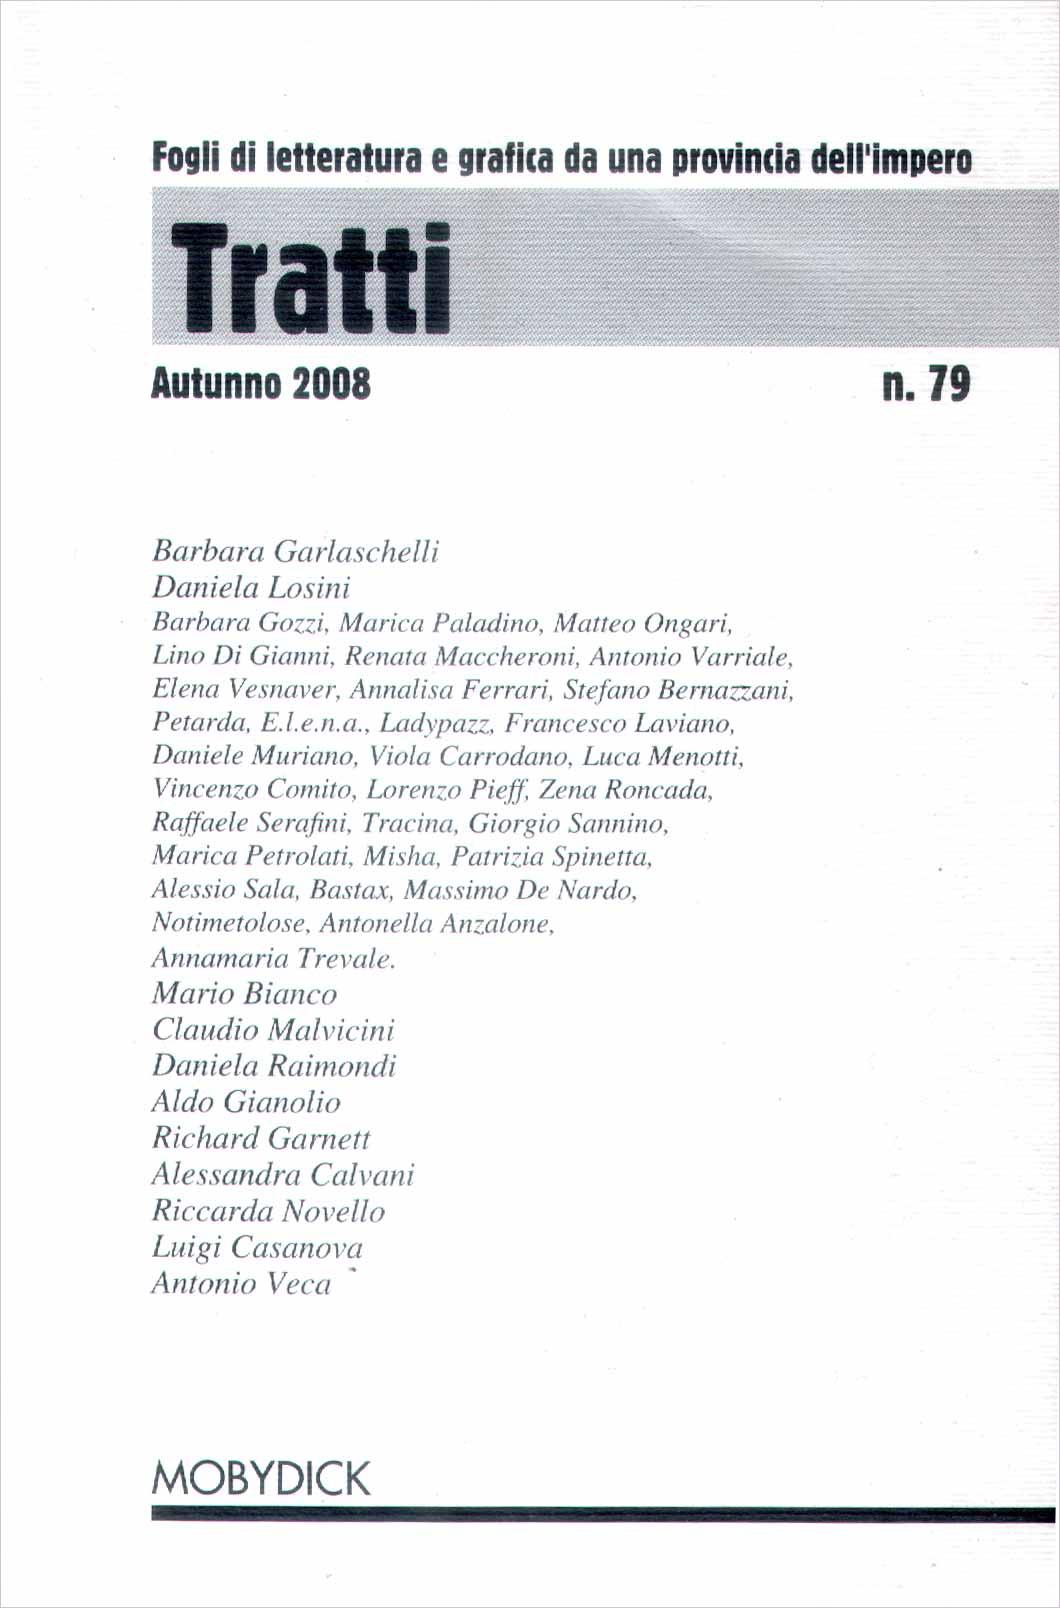 Tratti n. 79 - Autunno 2008